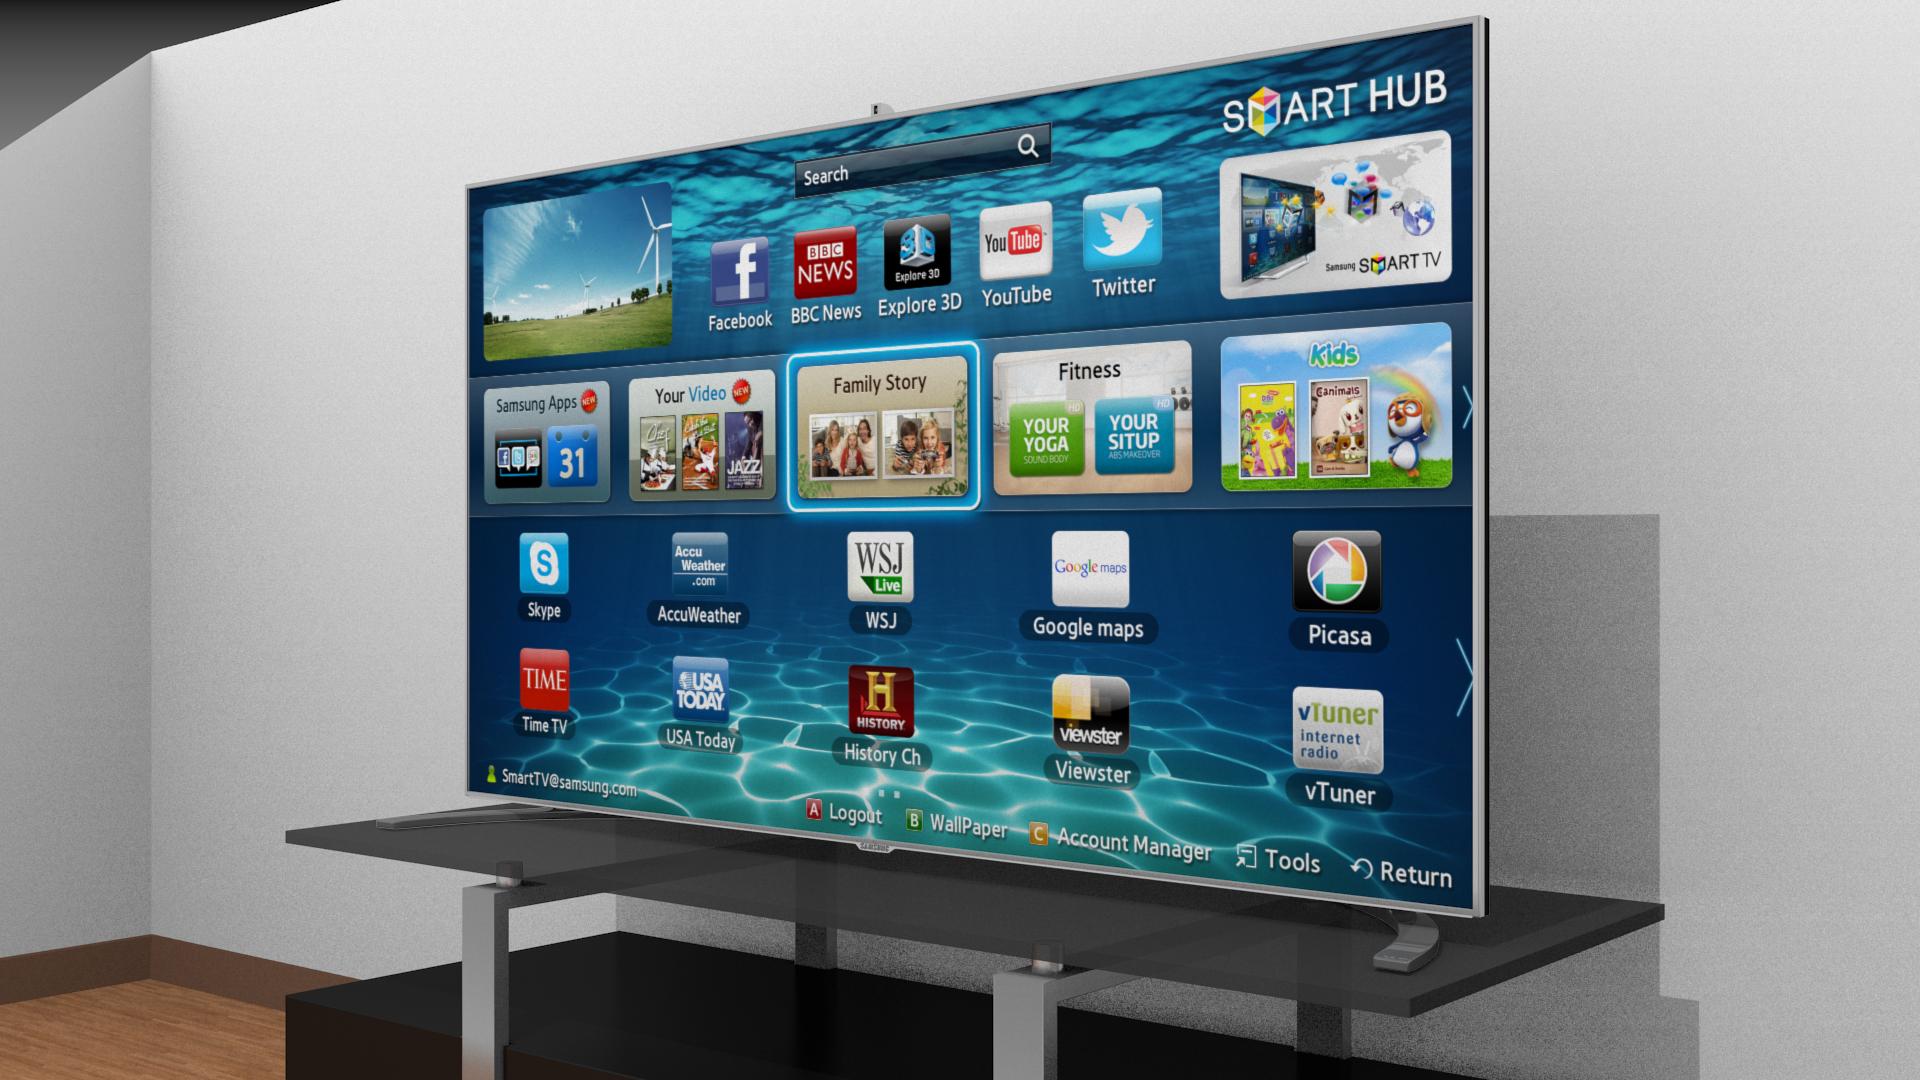 Samsung Smart Tv 39876 3d Model